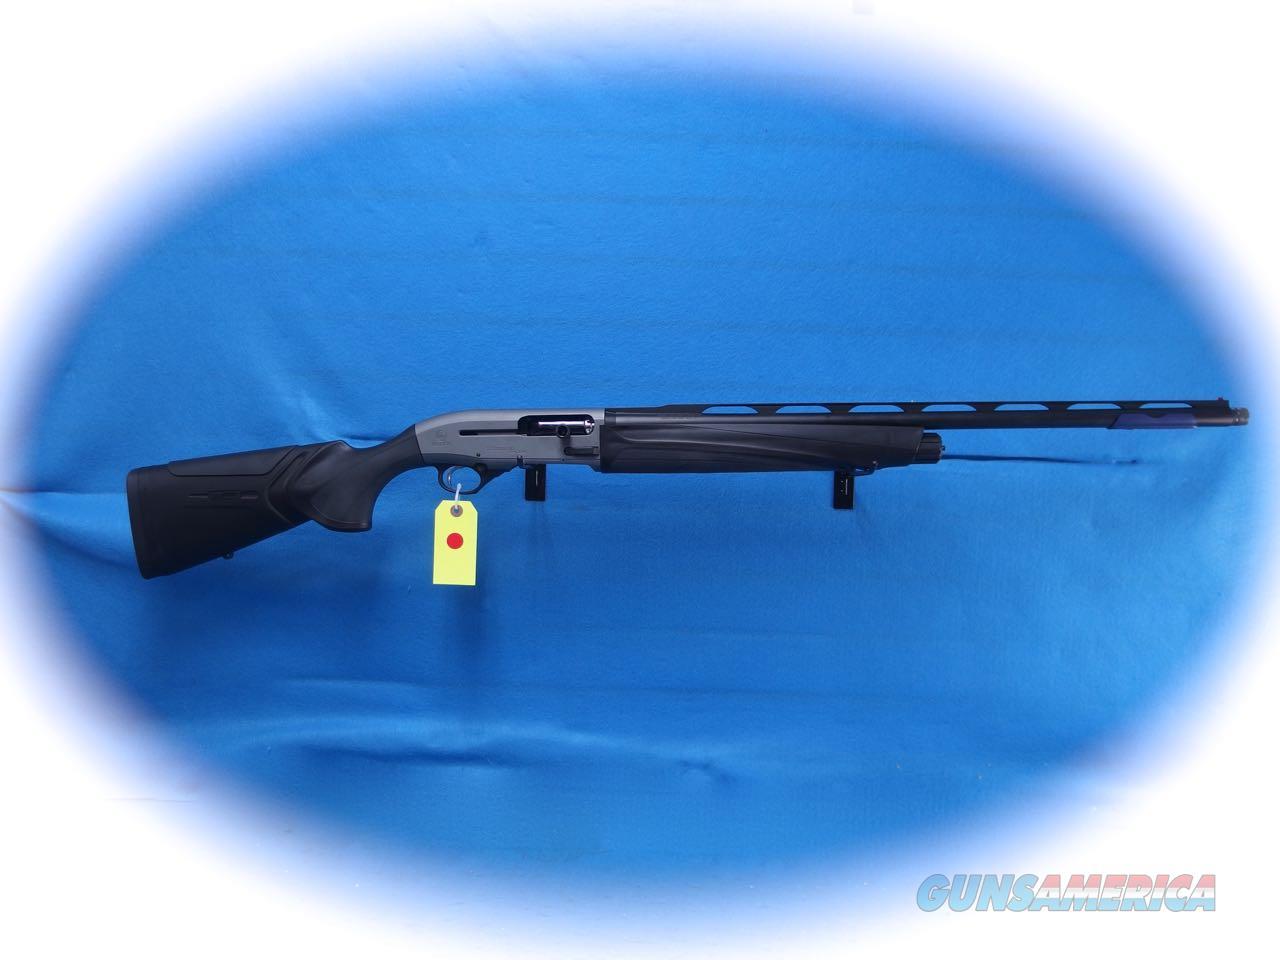 Beretta A400 Xtreme Plus 12 Ga. Semi Auto Shotgun Model J42XD18 **New **  Guns > Shotguns > Beretta Shotguns > Autoloaders > Hunting